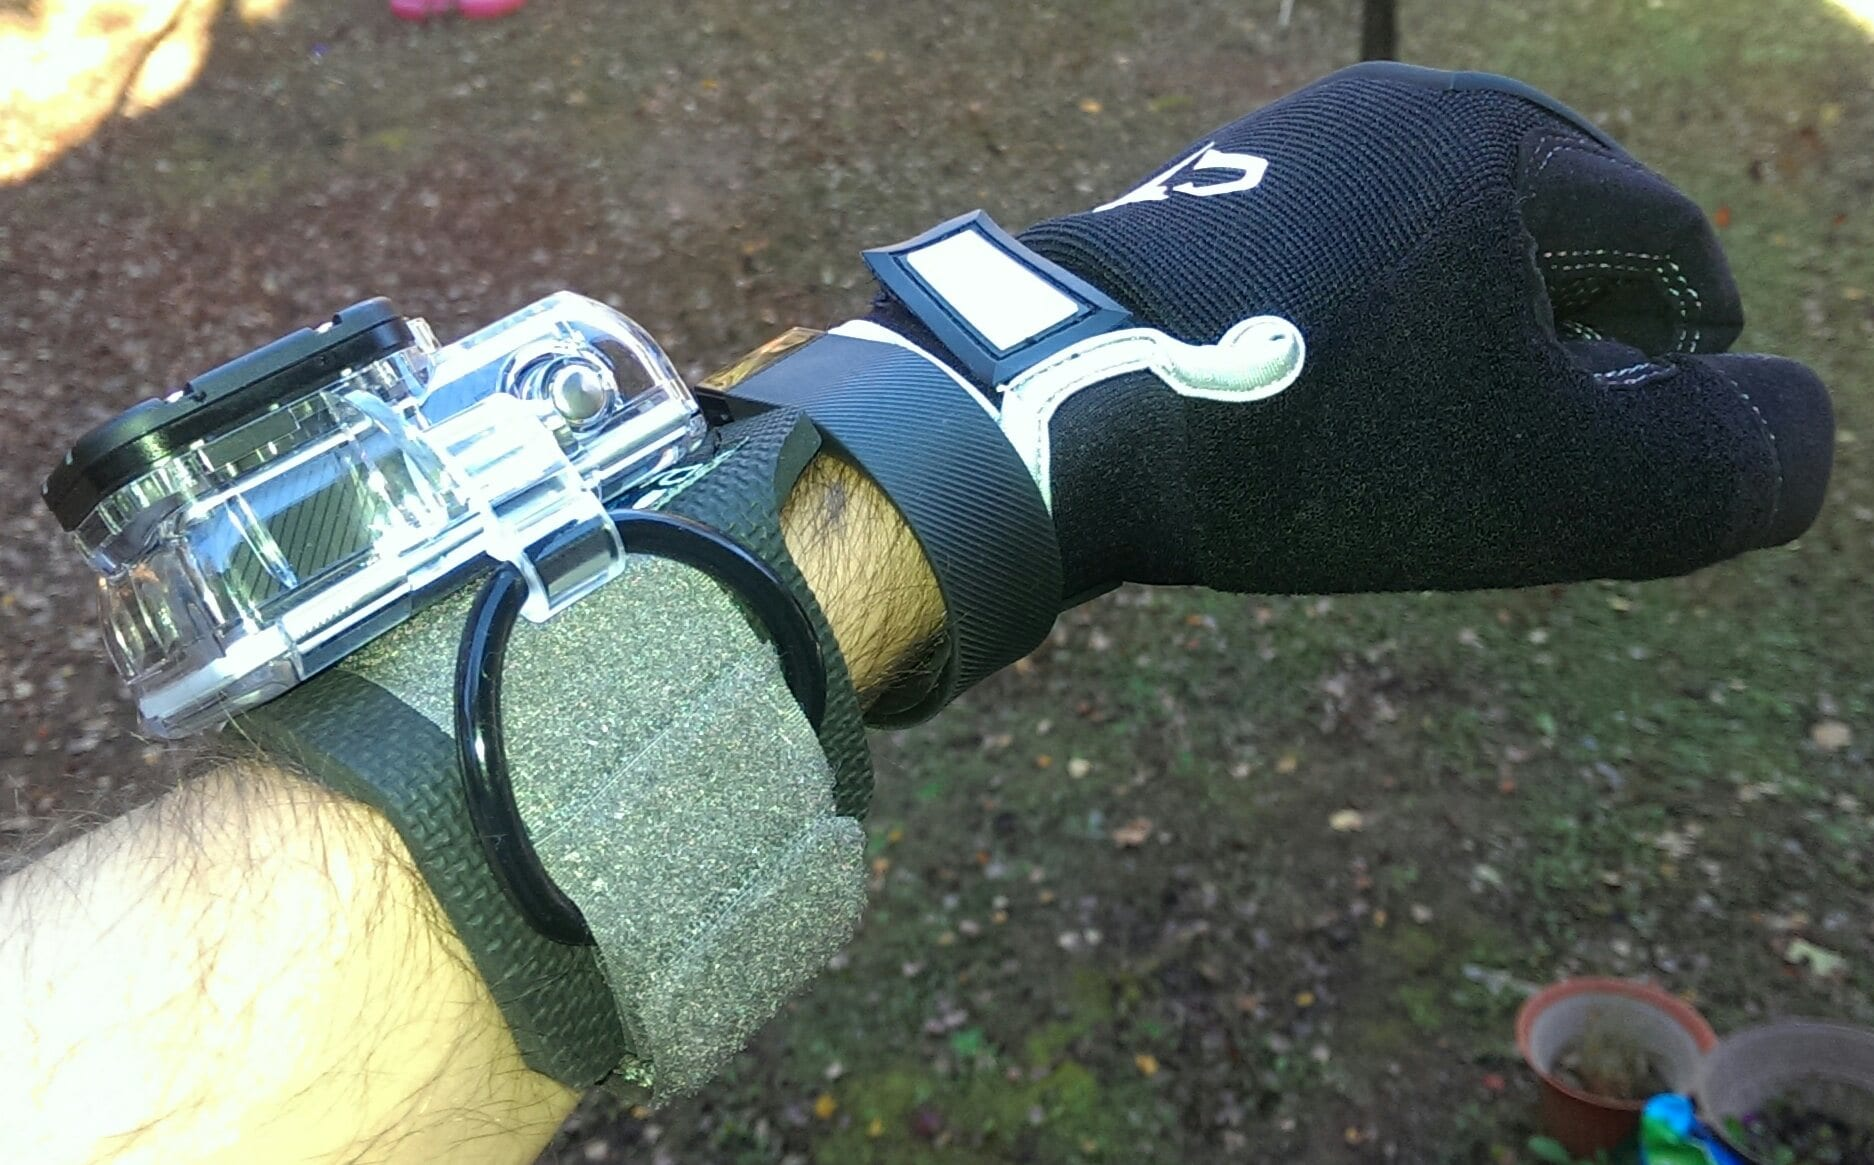 GoPro Wrist Housing In Use